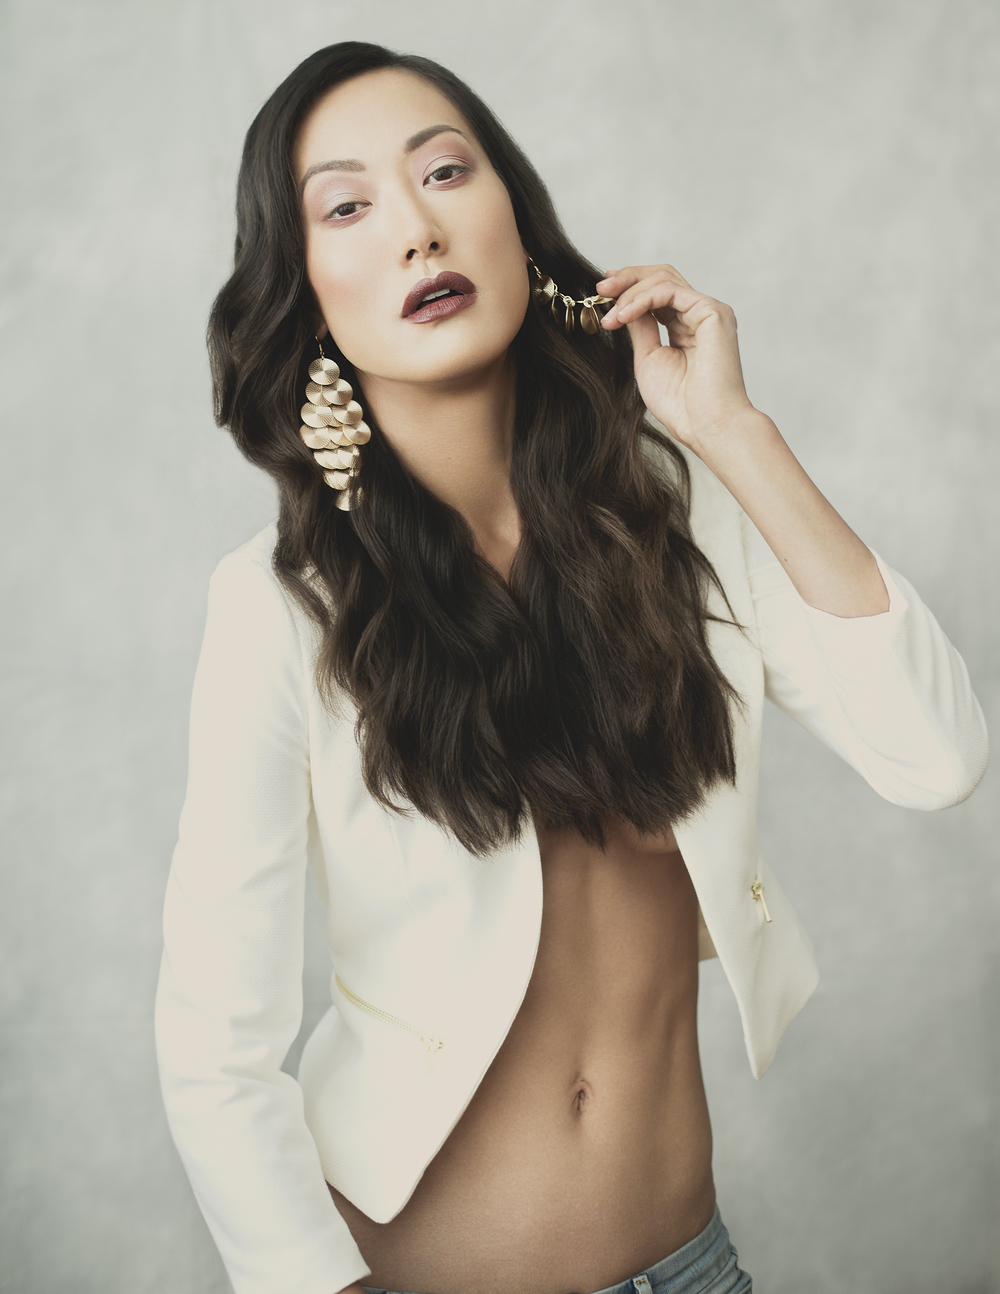 California's best fashion photographer alecia lindsay